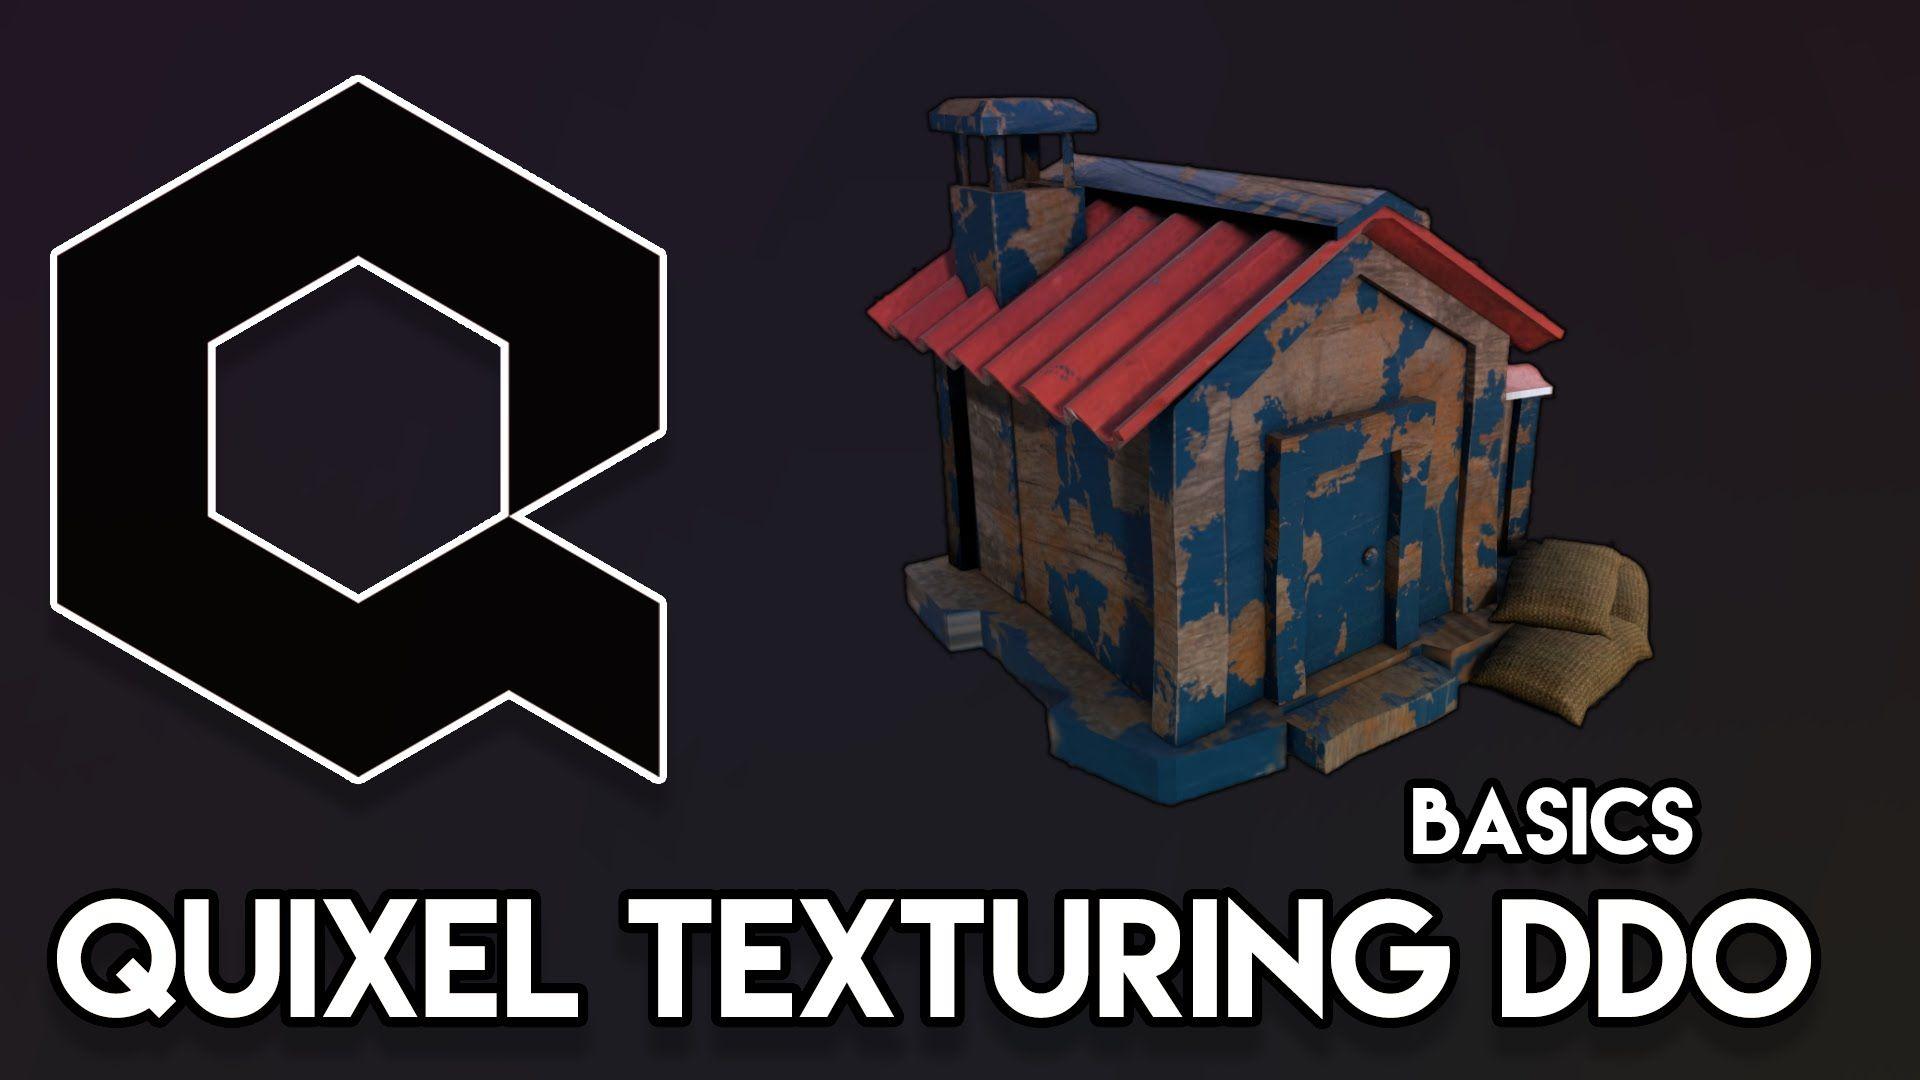 Quixel Basic DDO Texturing Tutorial Tutorial, 3d